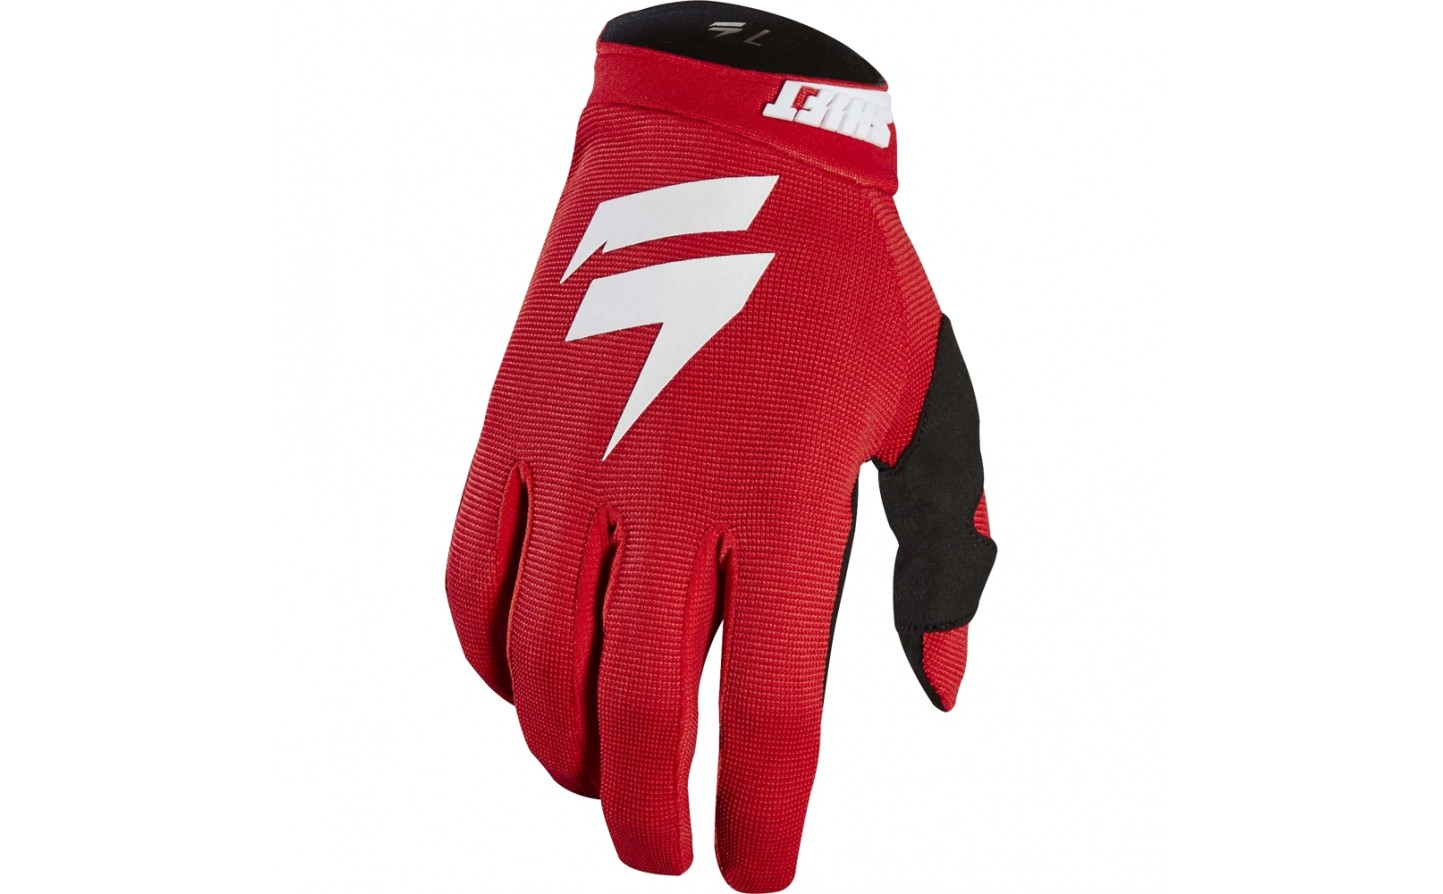 guante shift whit3 air glove rojo/blanco talle m